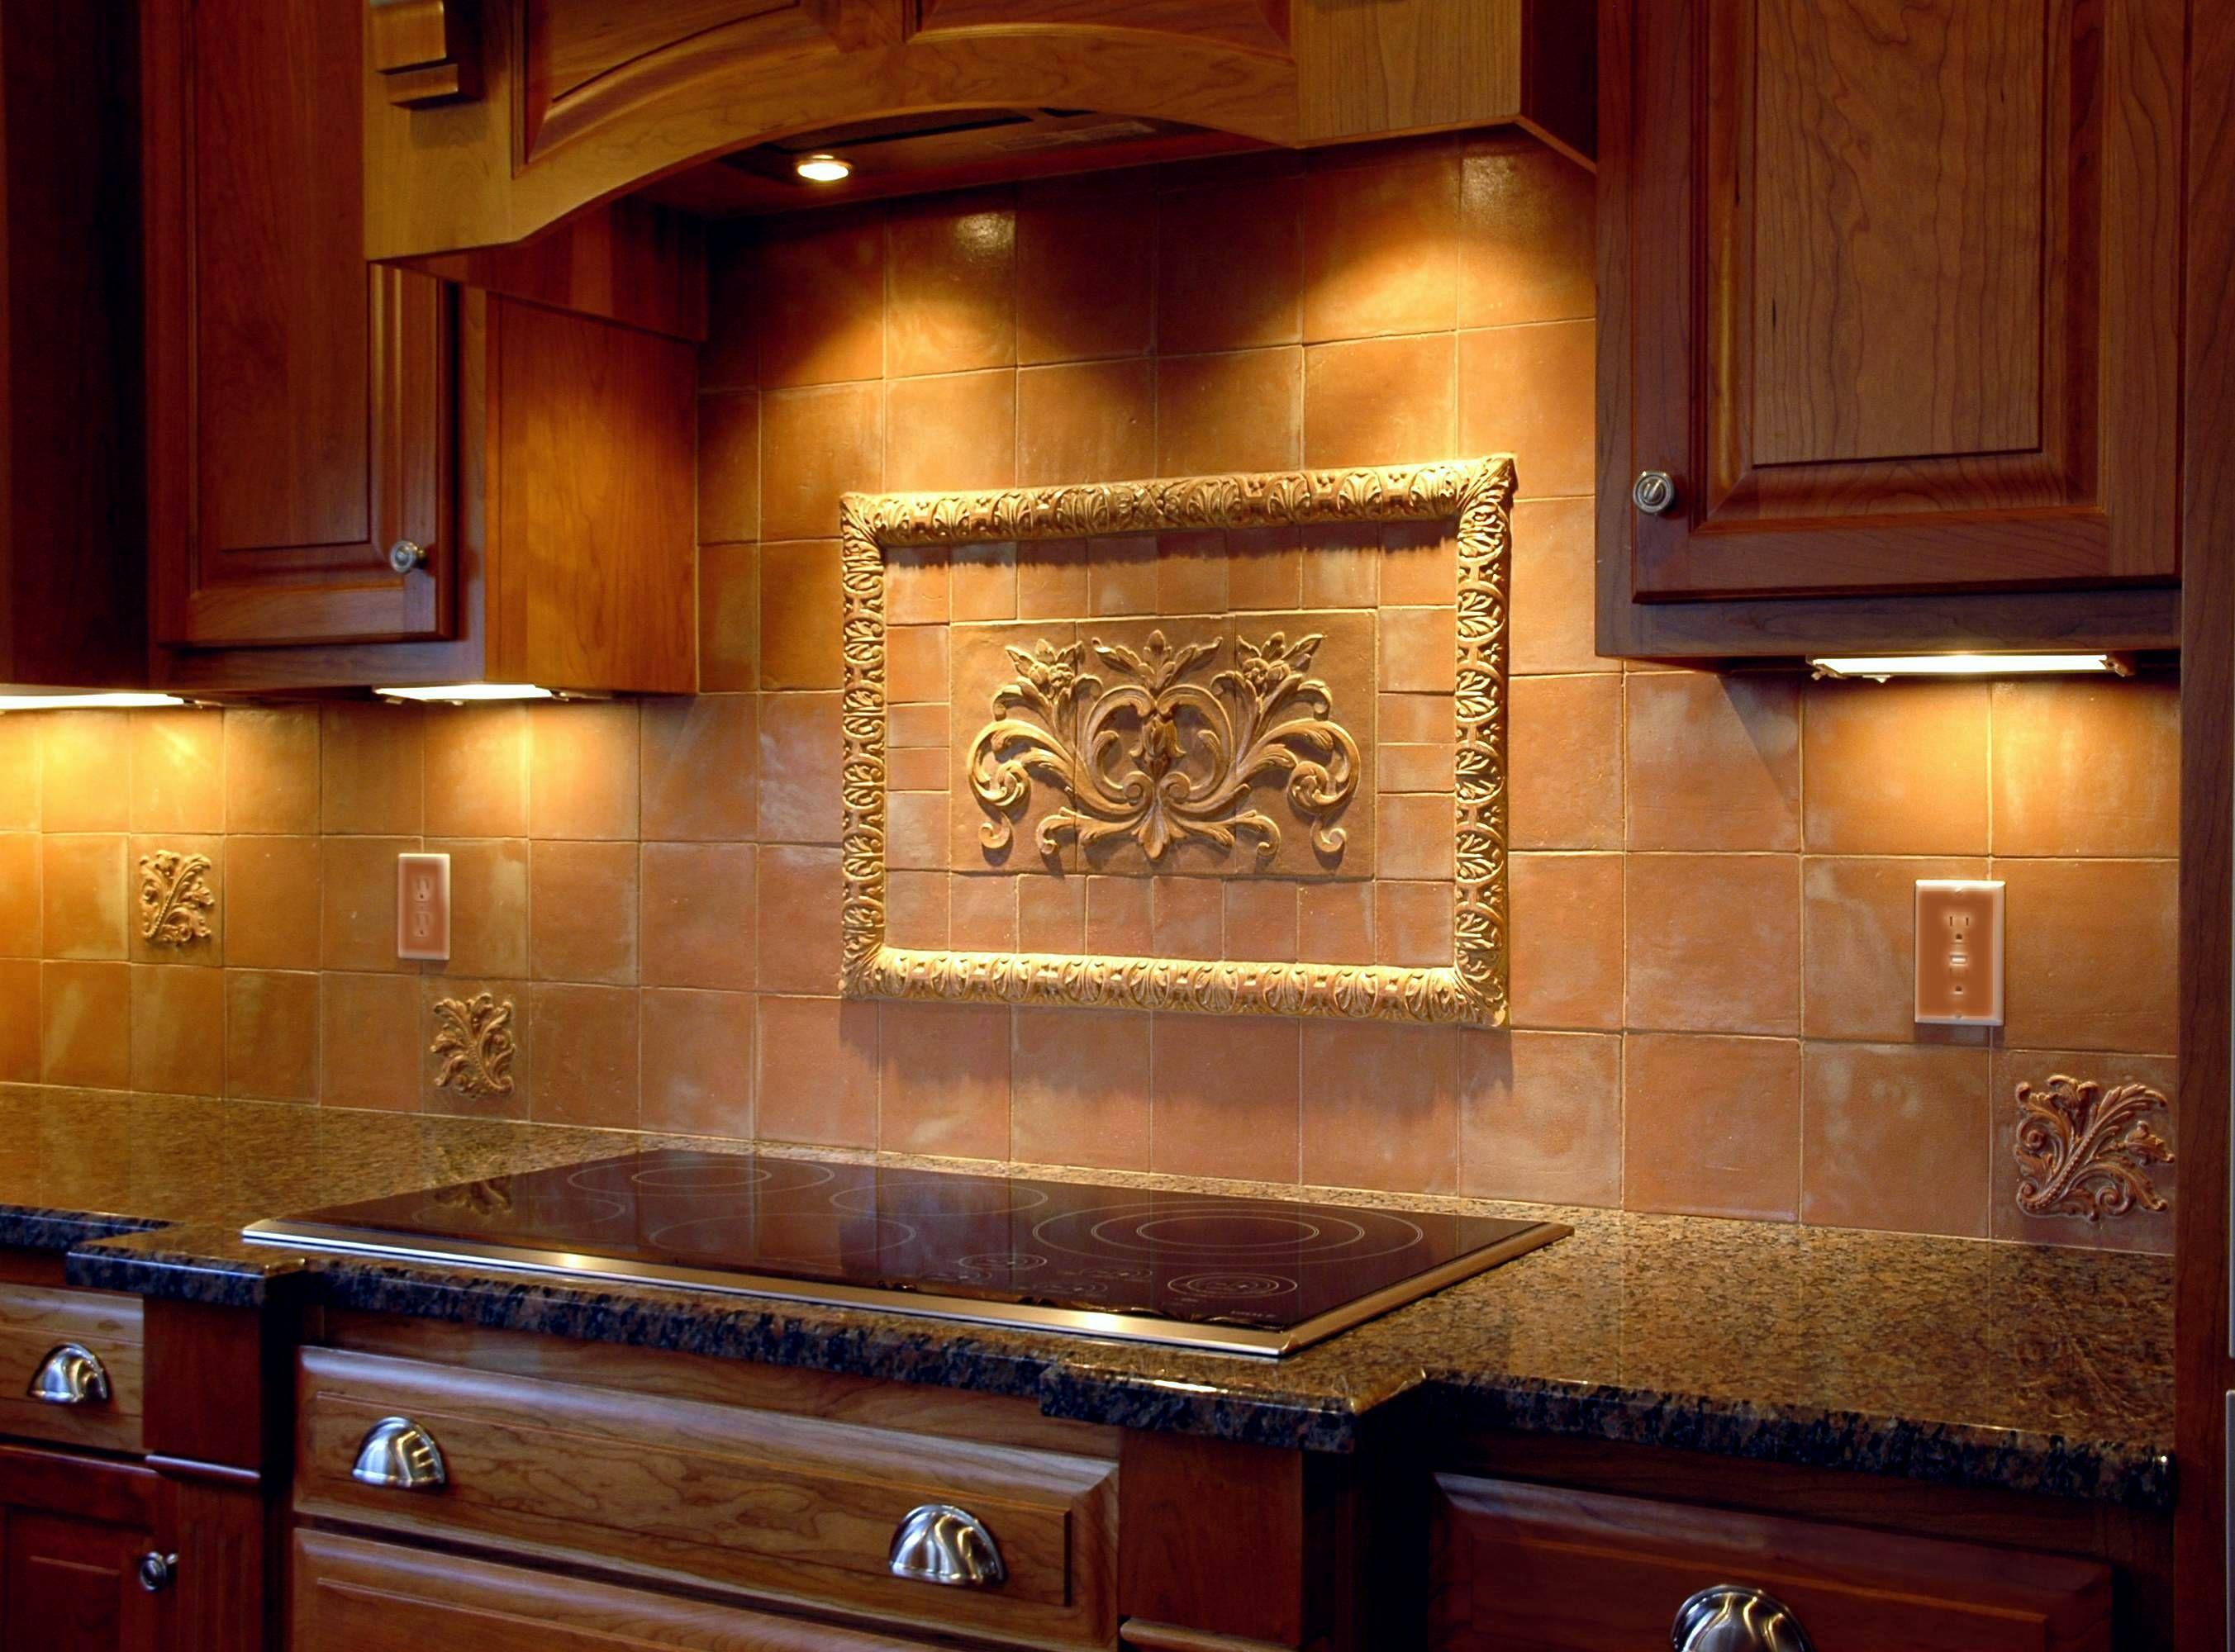 Tile Murals Kitchen Backsplash | //jubiz.info | Pinterest ... on mural painting ideas, mural kitchen backsplash examples, mural living room ideas, mural tile, tuscan kitchen tile ideas, western backsplash ideas,